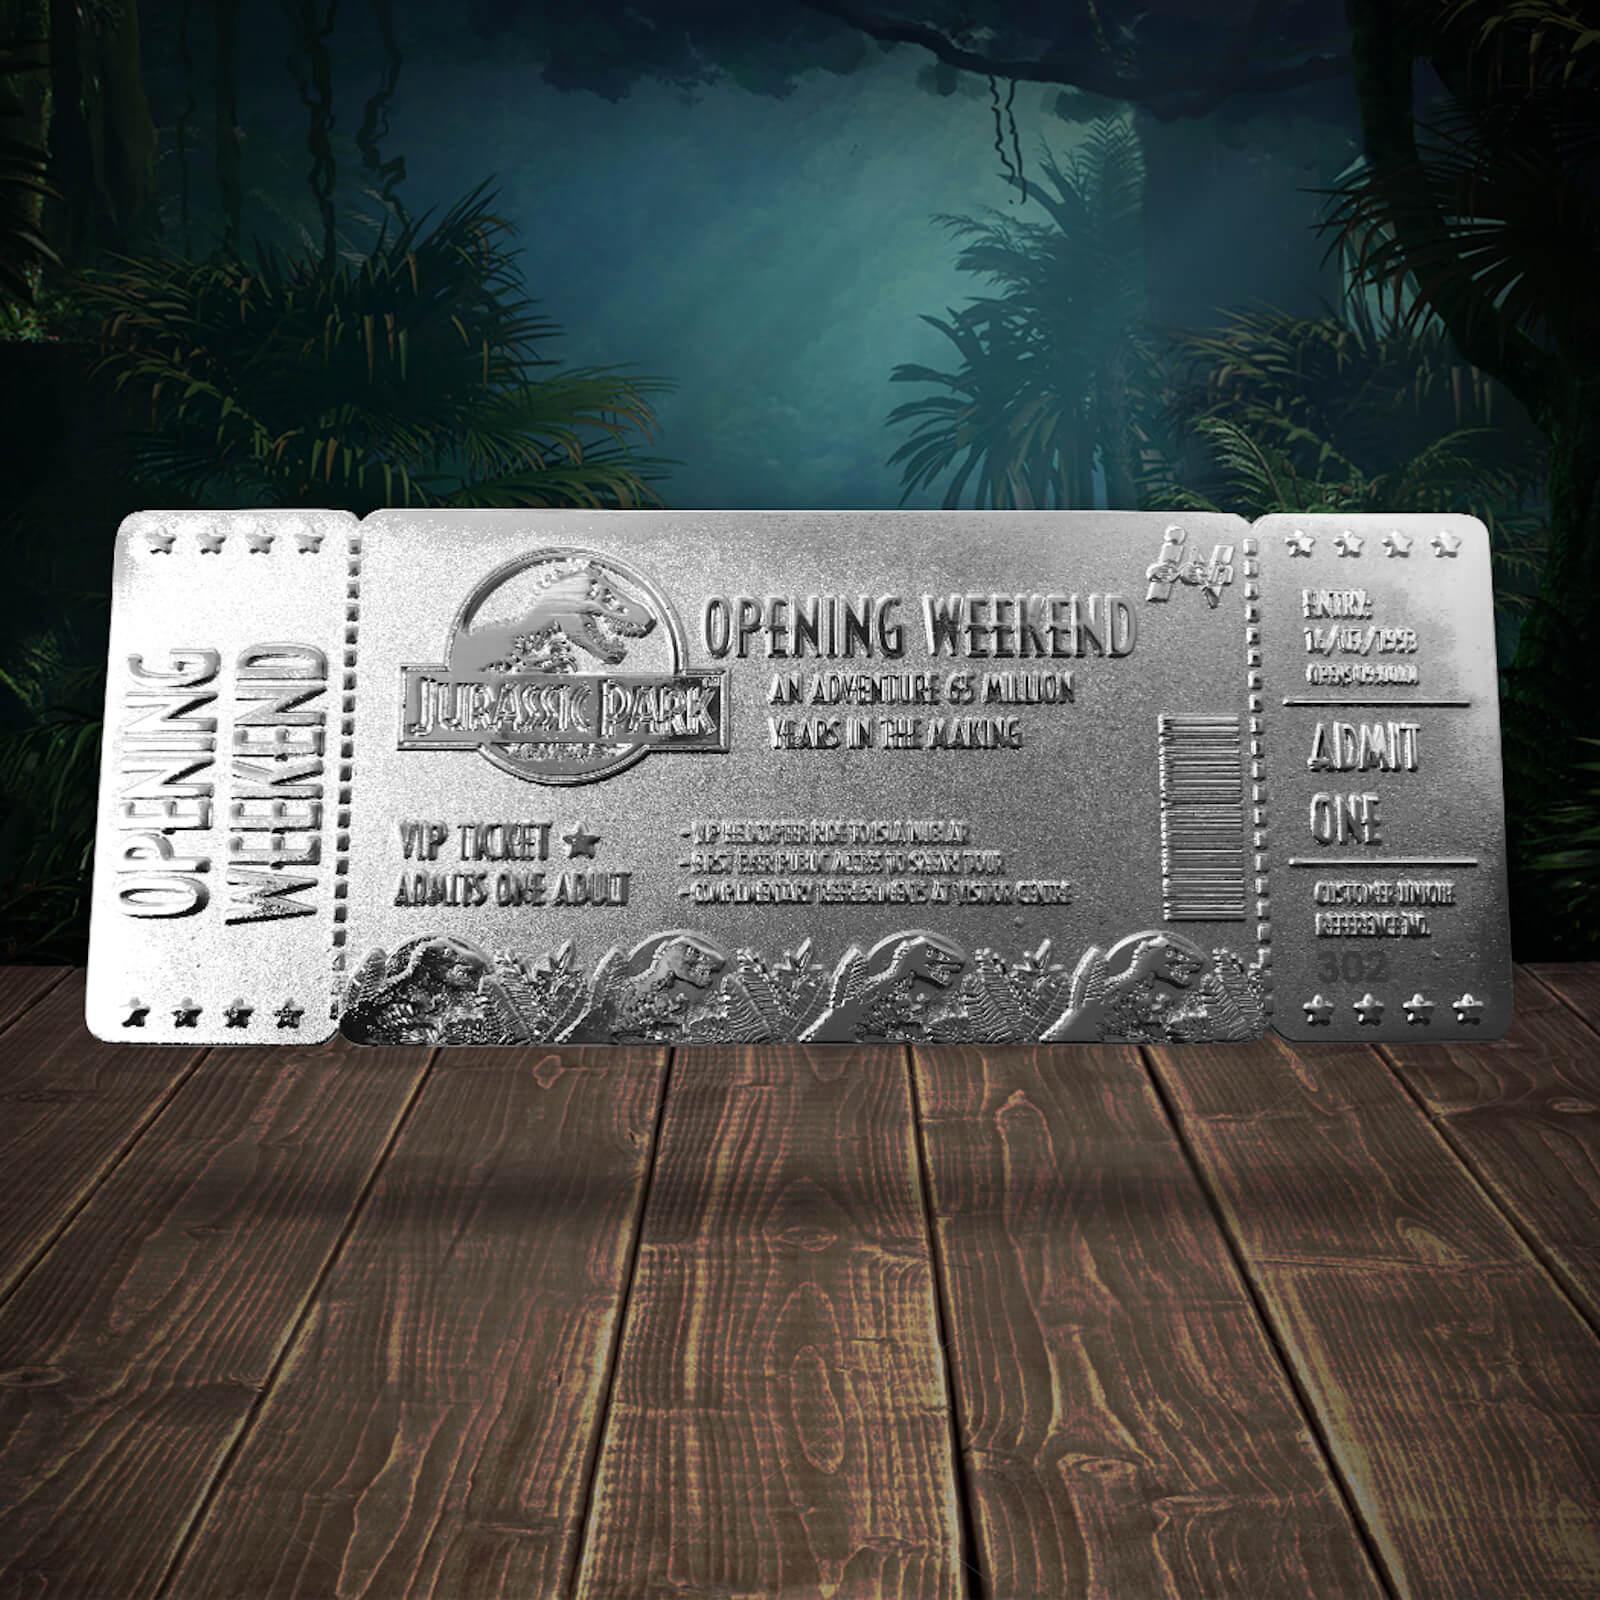 Ticket de Entrada Jurassic Park (Bañado en plata) - Edición Limitada